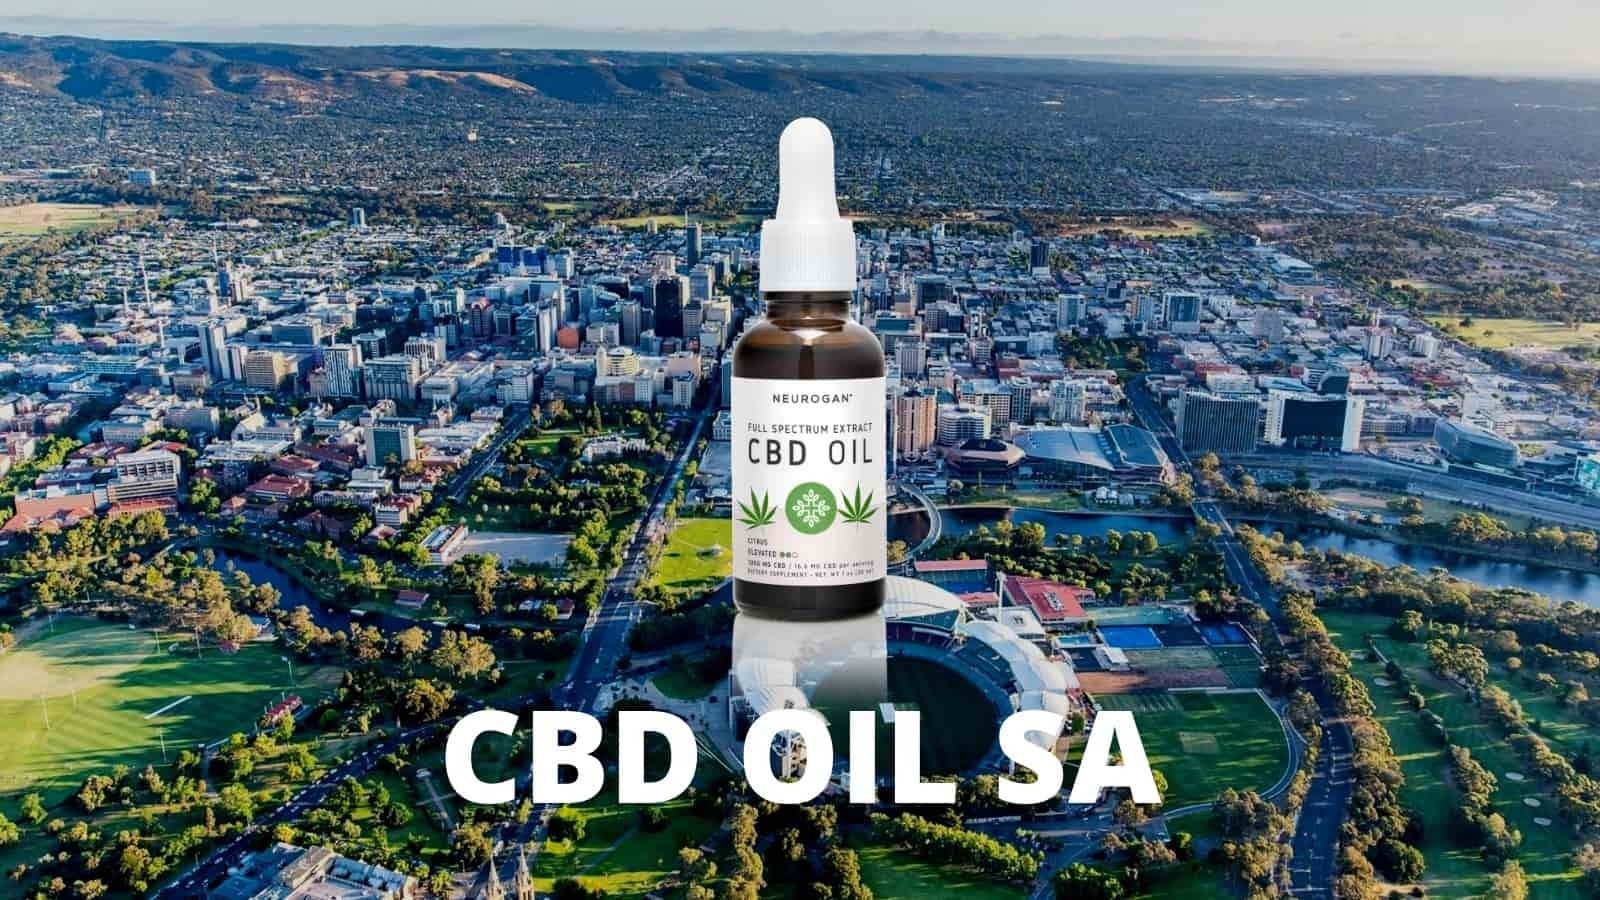 Is CBD Oil Legal in SA?